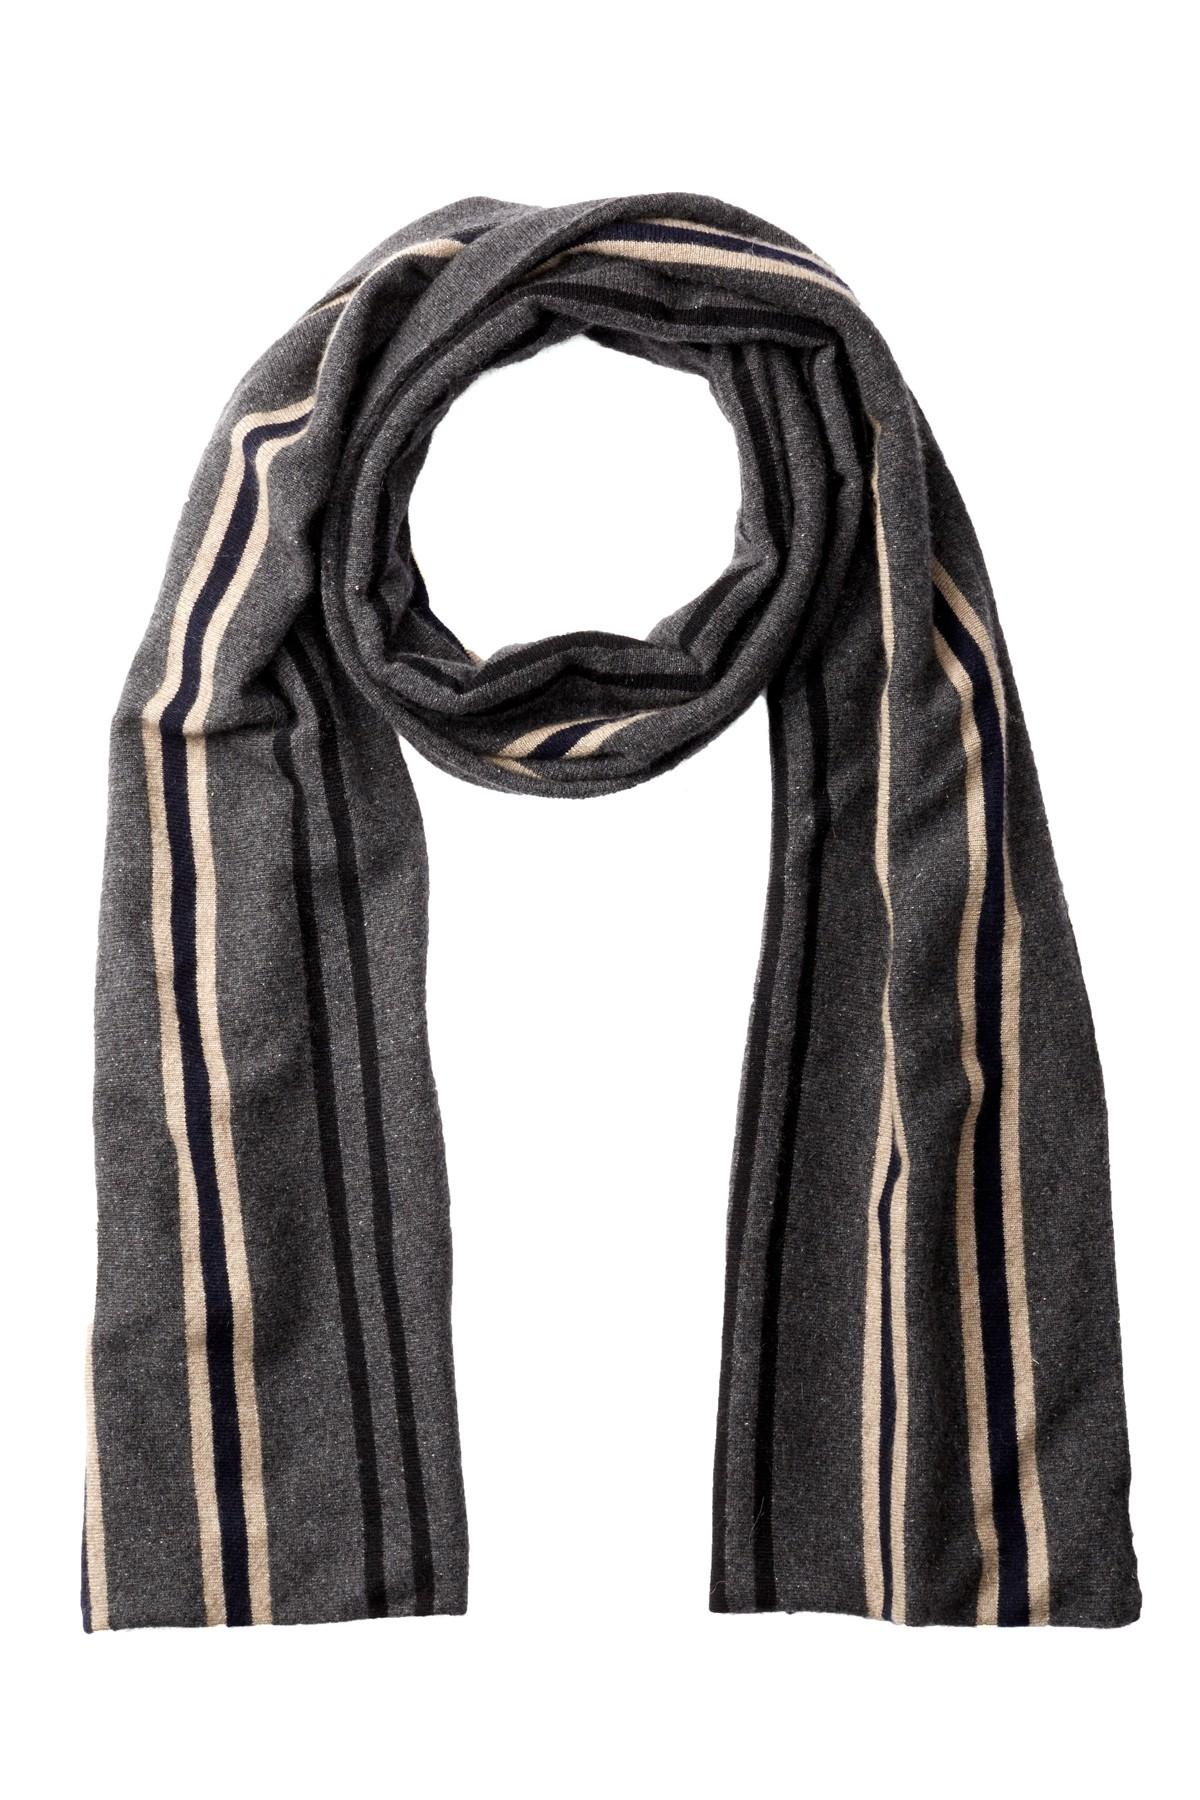 Portolano Multi Color Striped Scarf In Black For Men